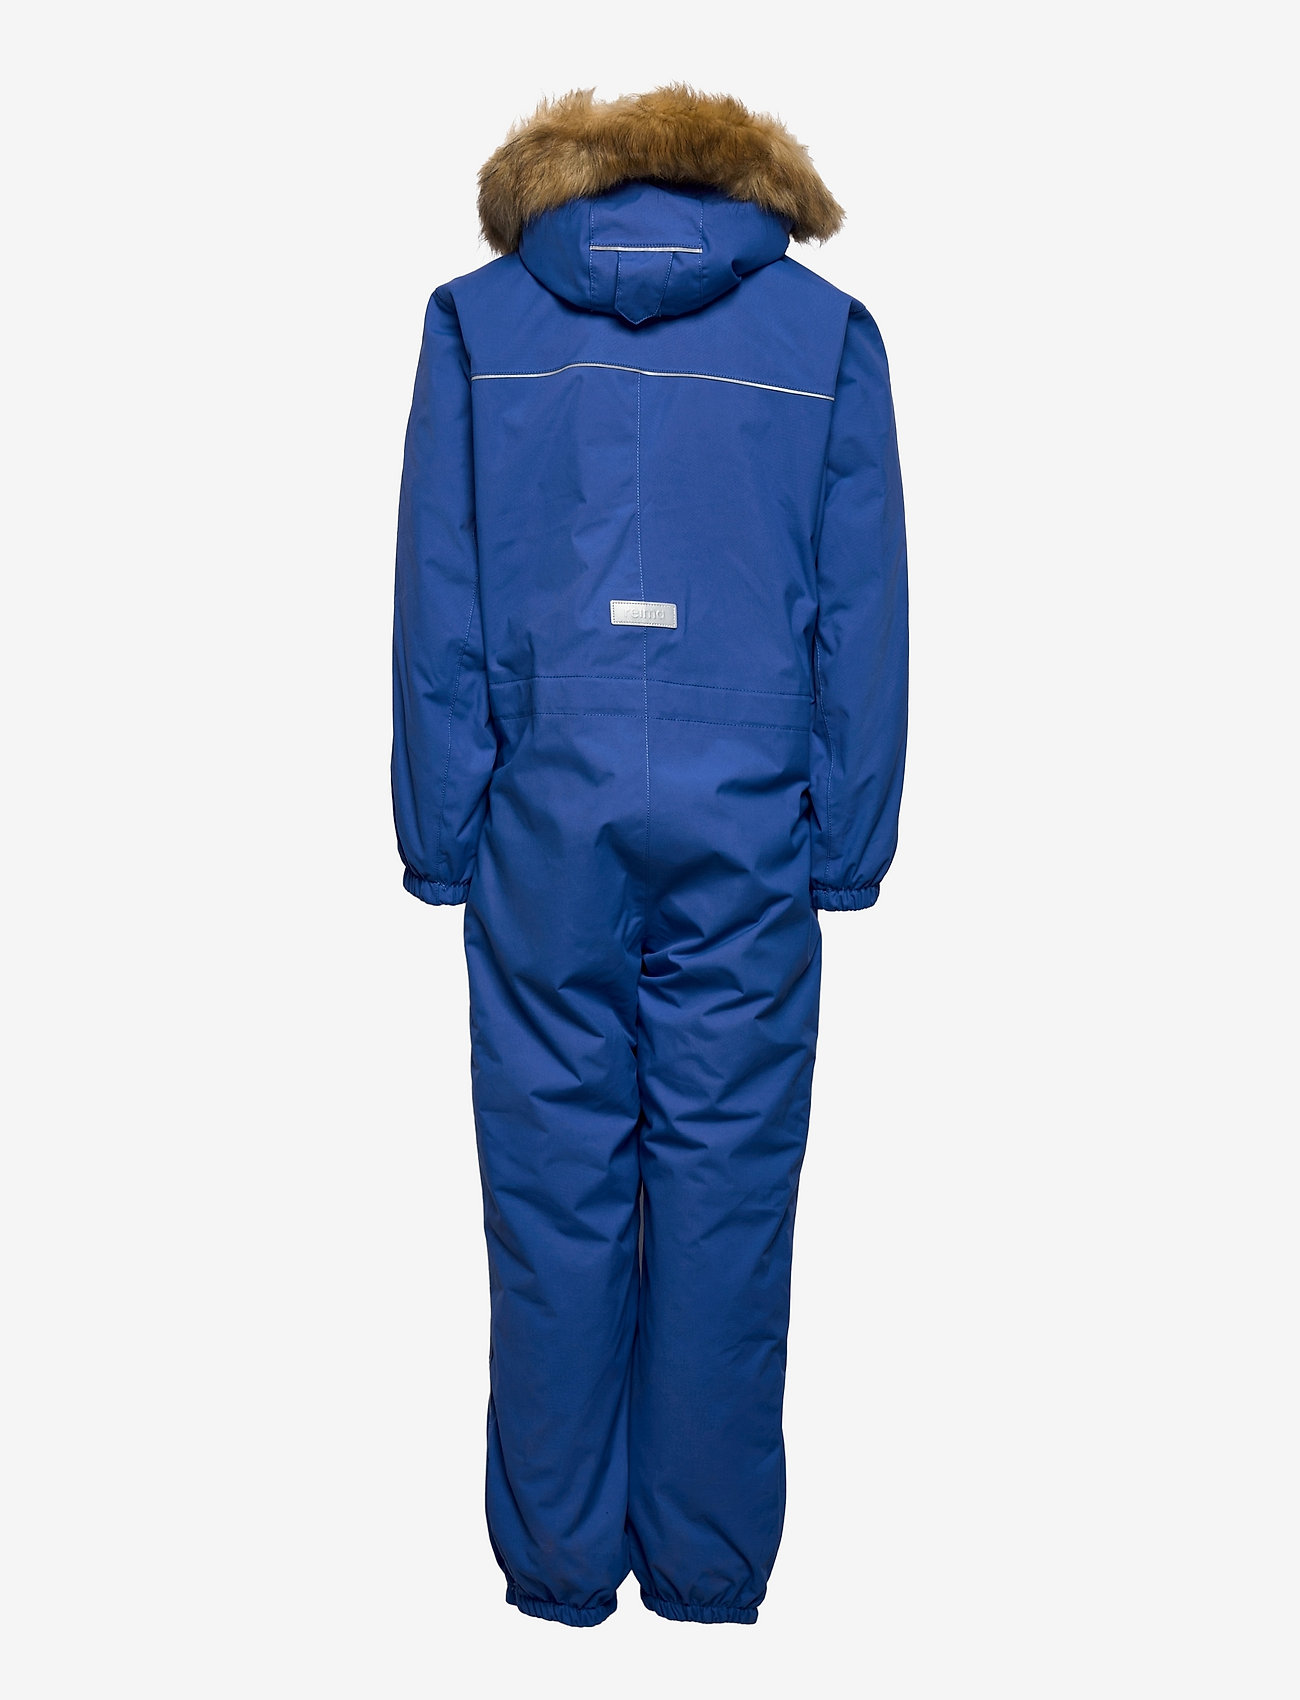 Reima - Stavanger - snowsuit - marine blue - 1